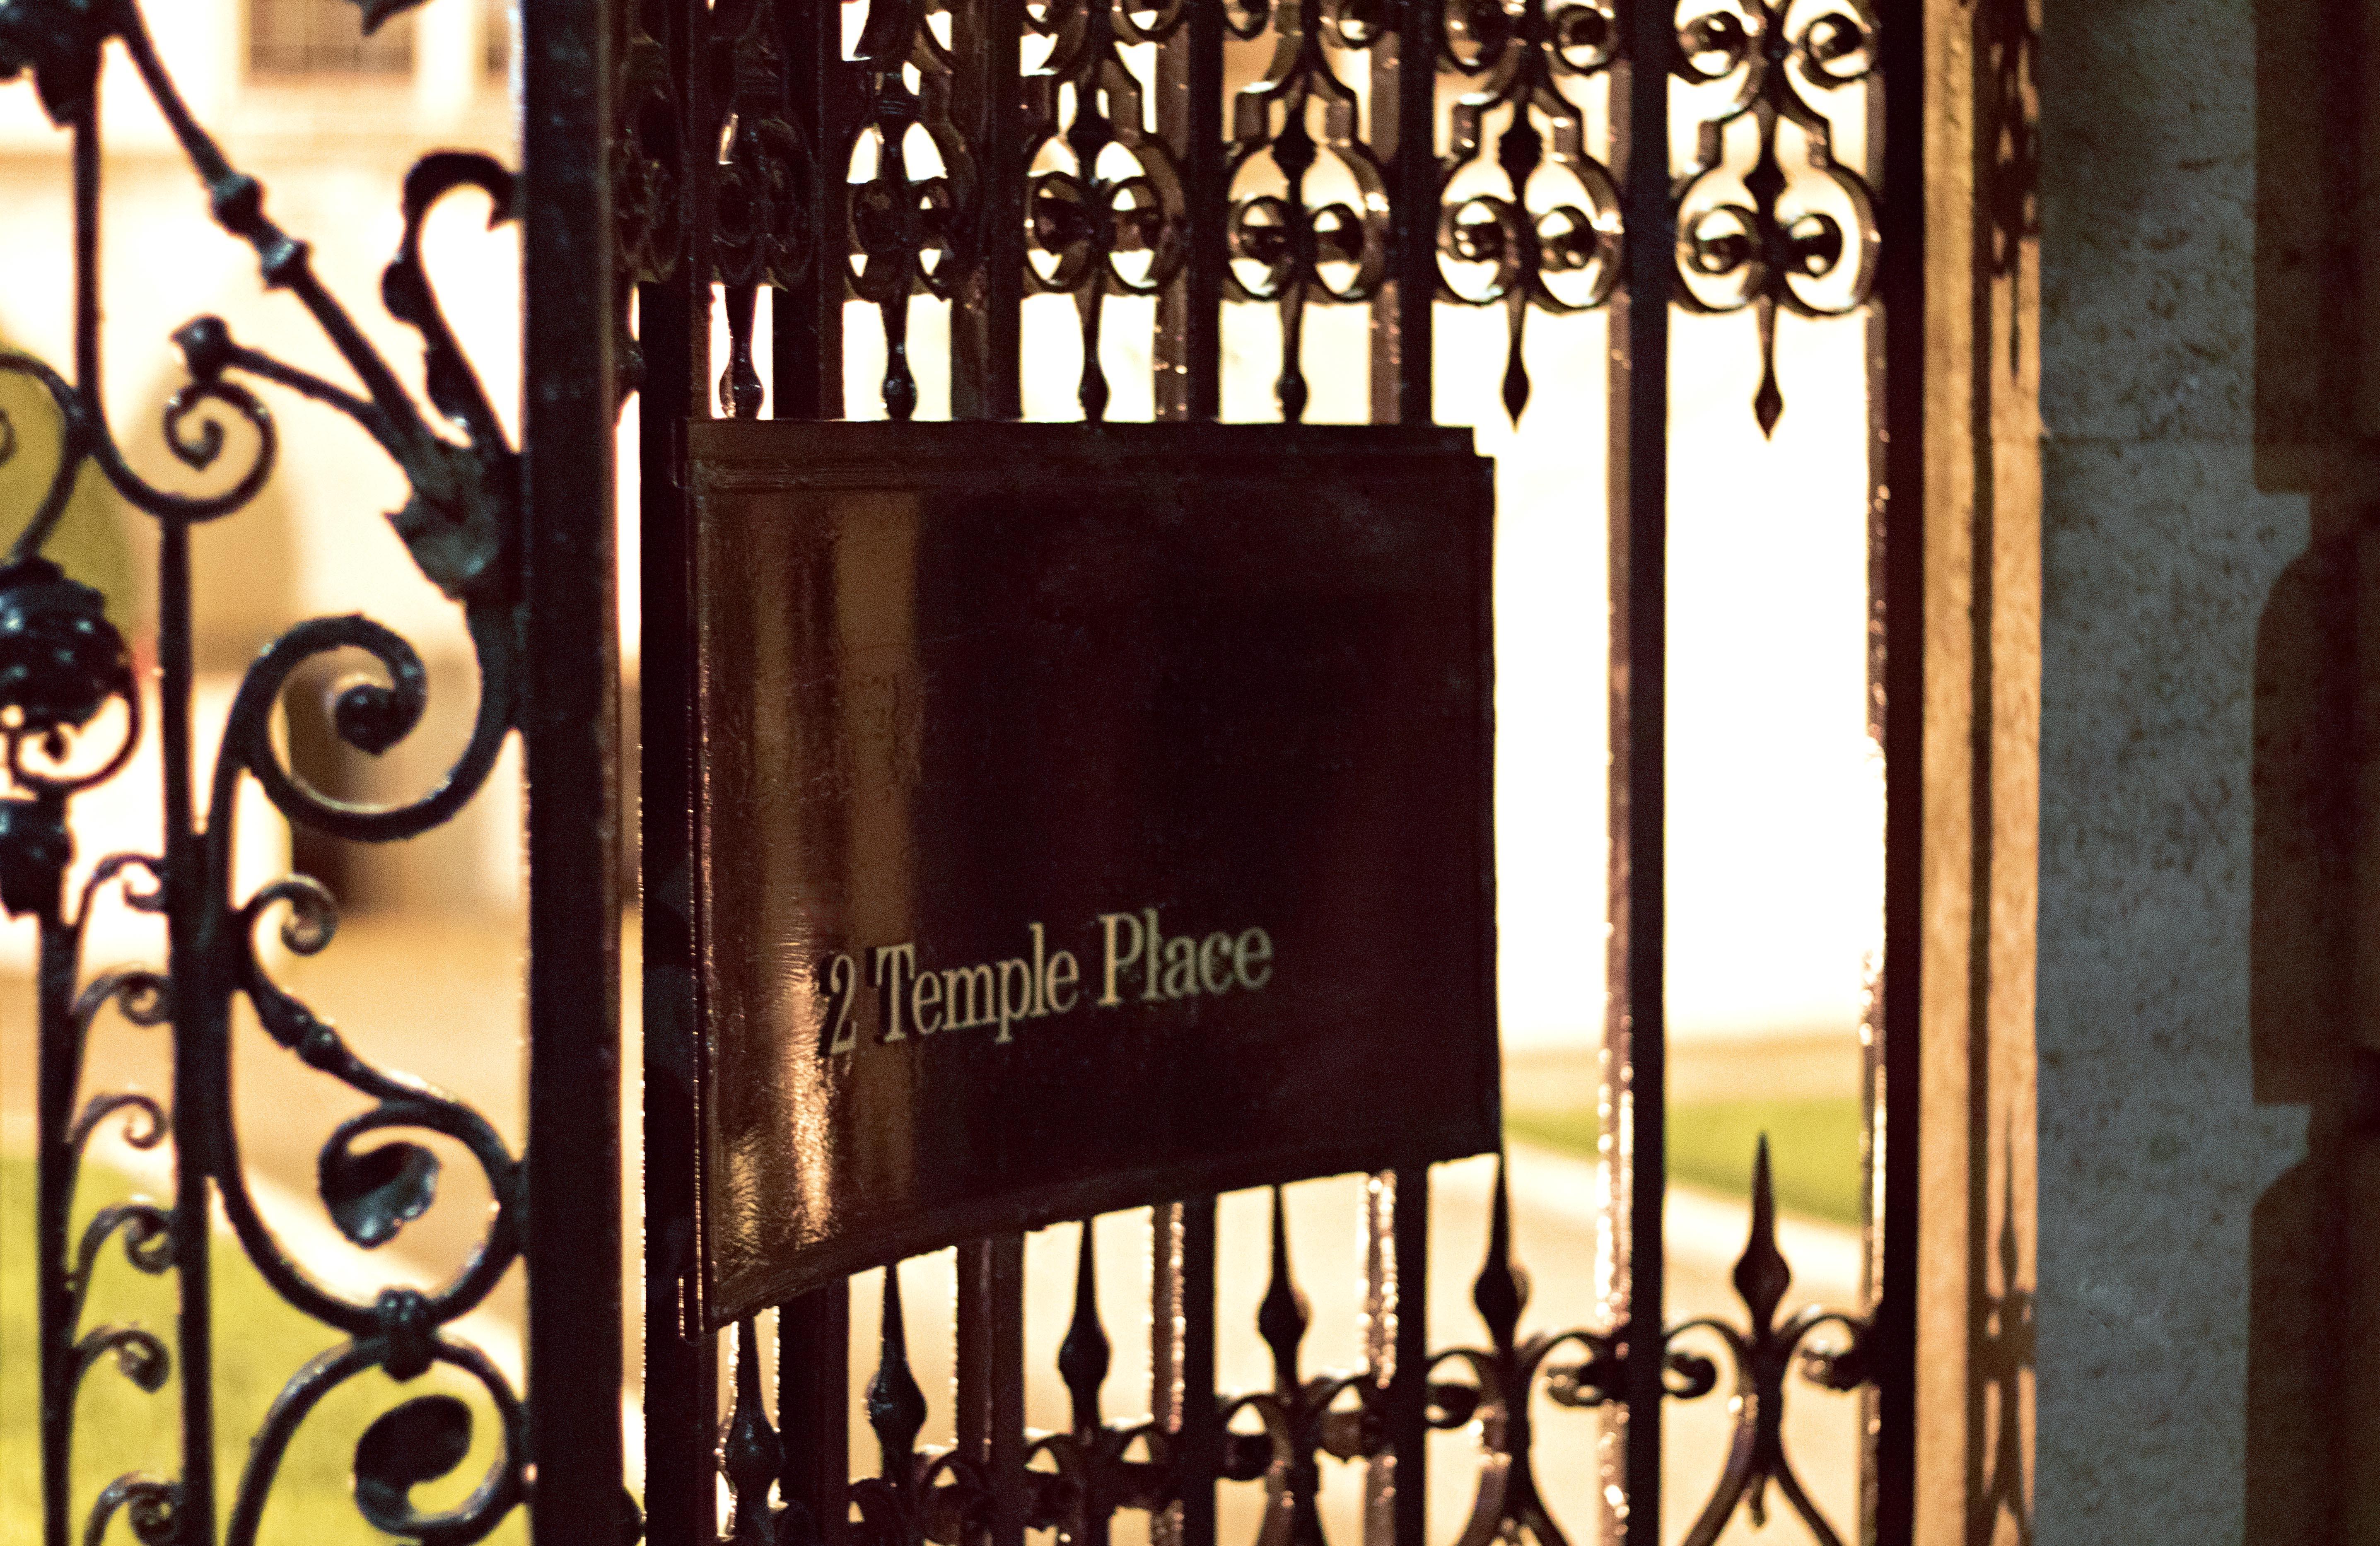 Temple Place